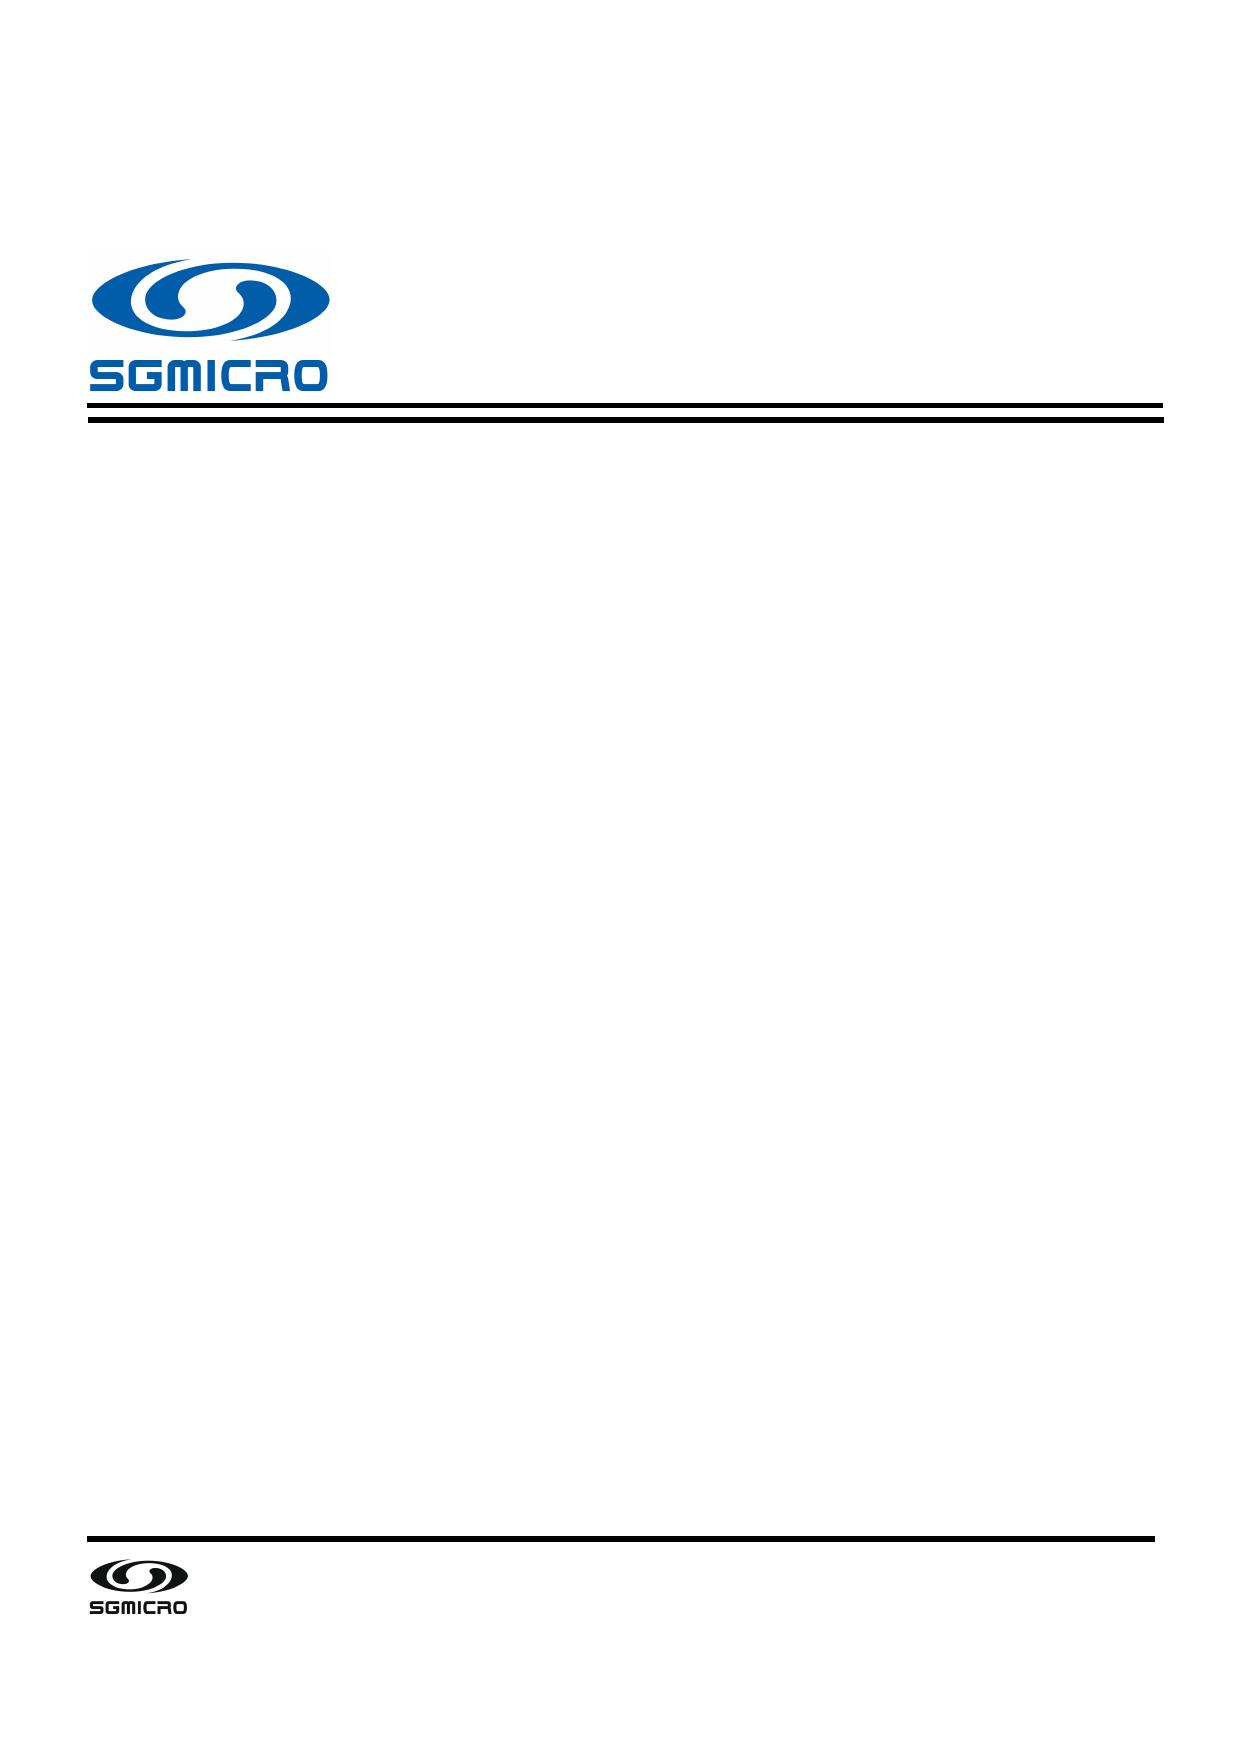 SGM8926 datasheet, circuit